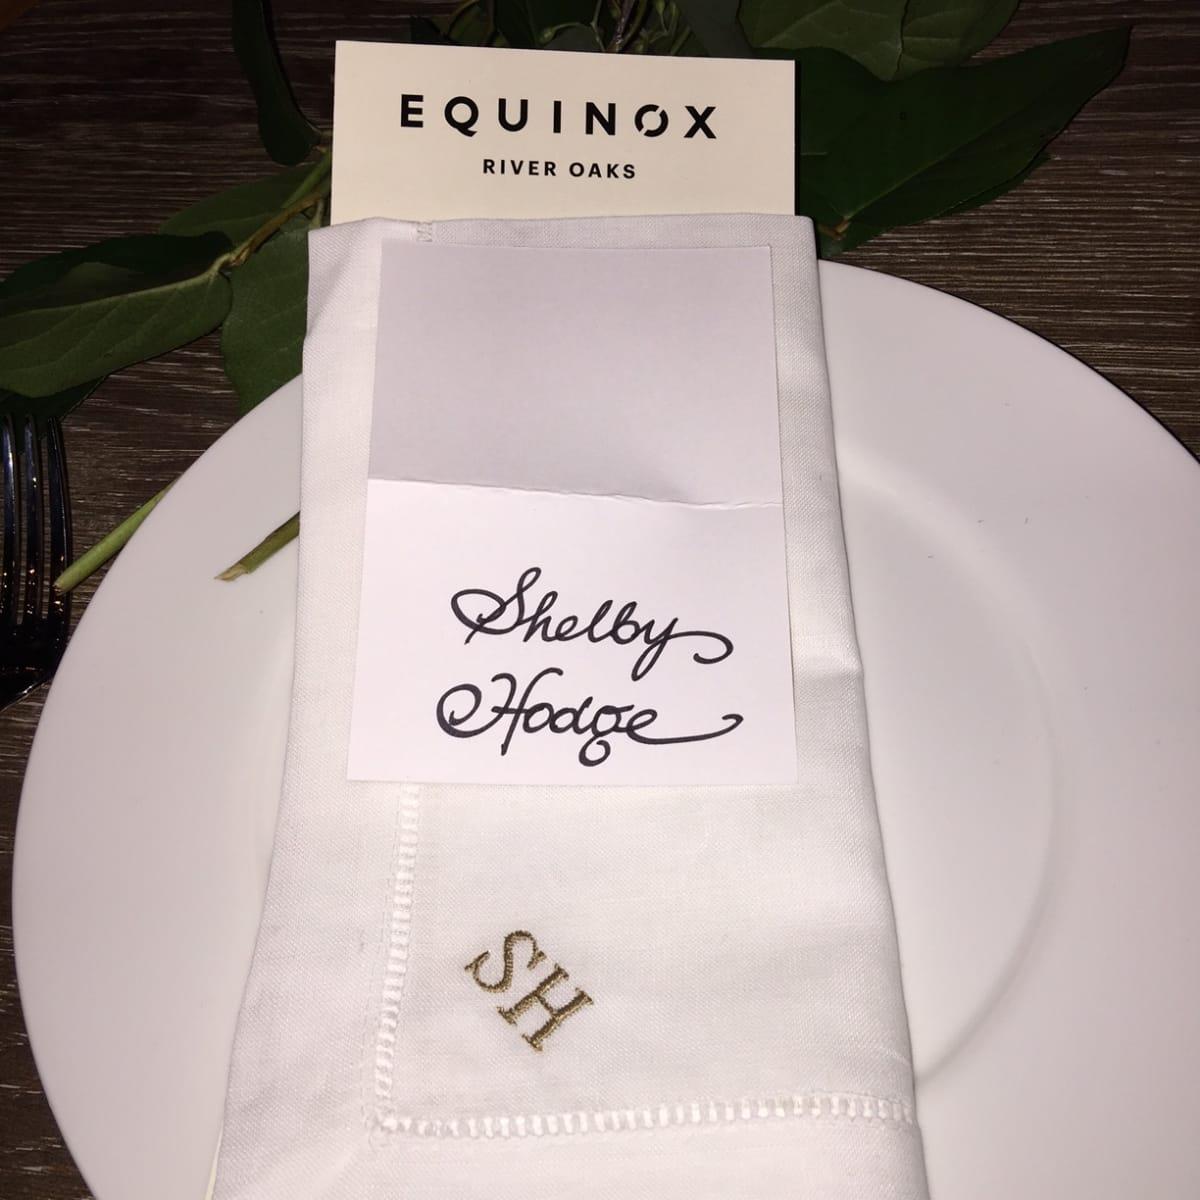 News, Equinox Opening Dinner, Dec. 2015, monogramed napkins